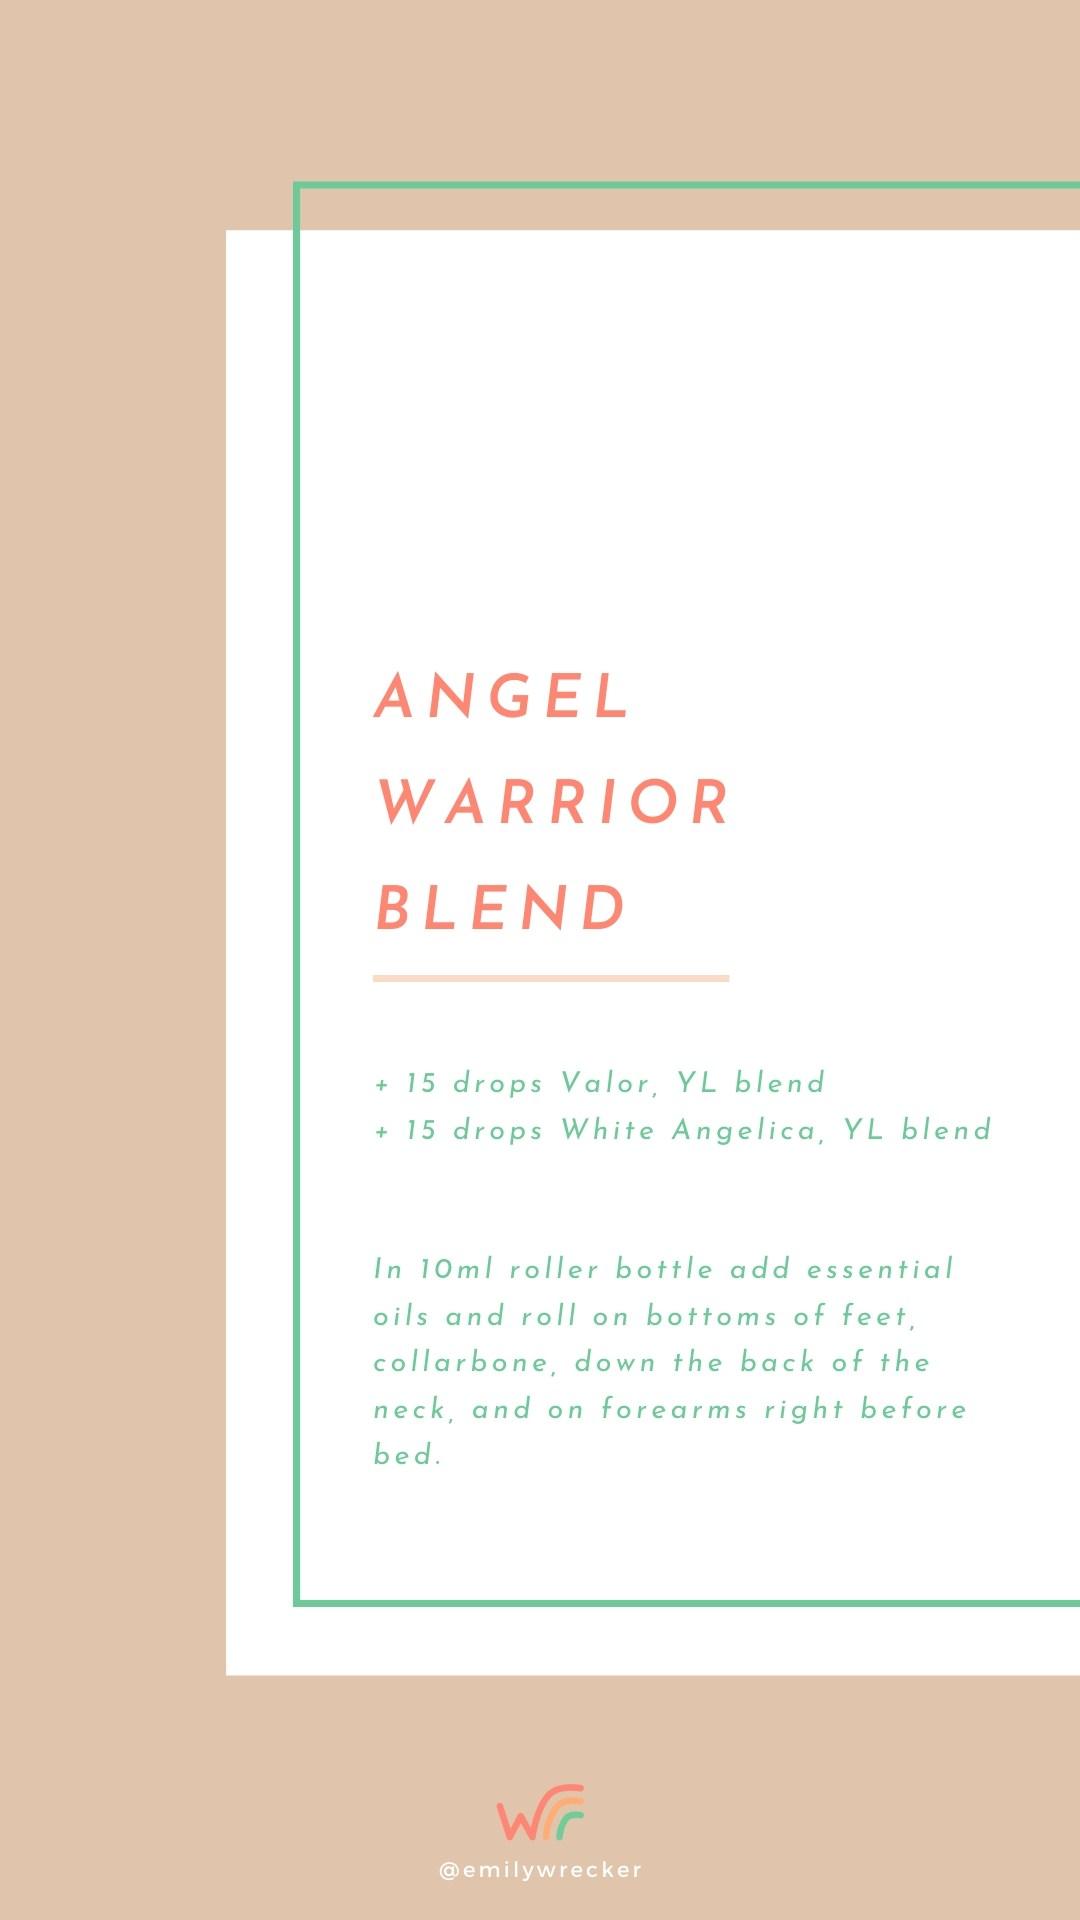 Angel Warrior Essential Oil Blend For Crystal Roller Bottle Whimsy + Wellness